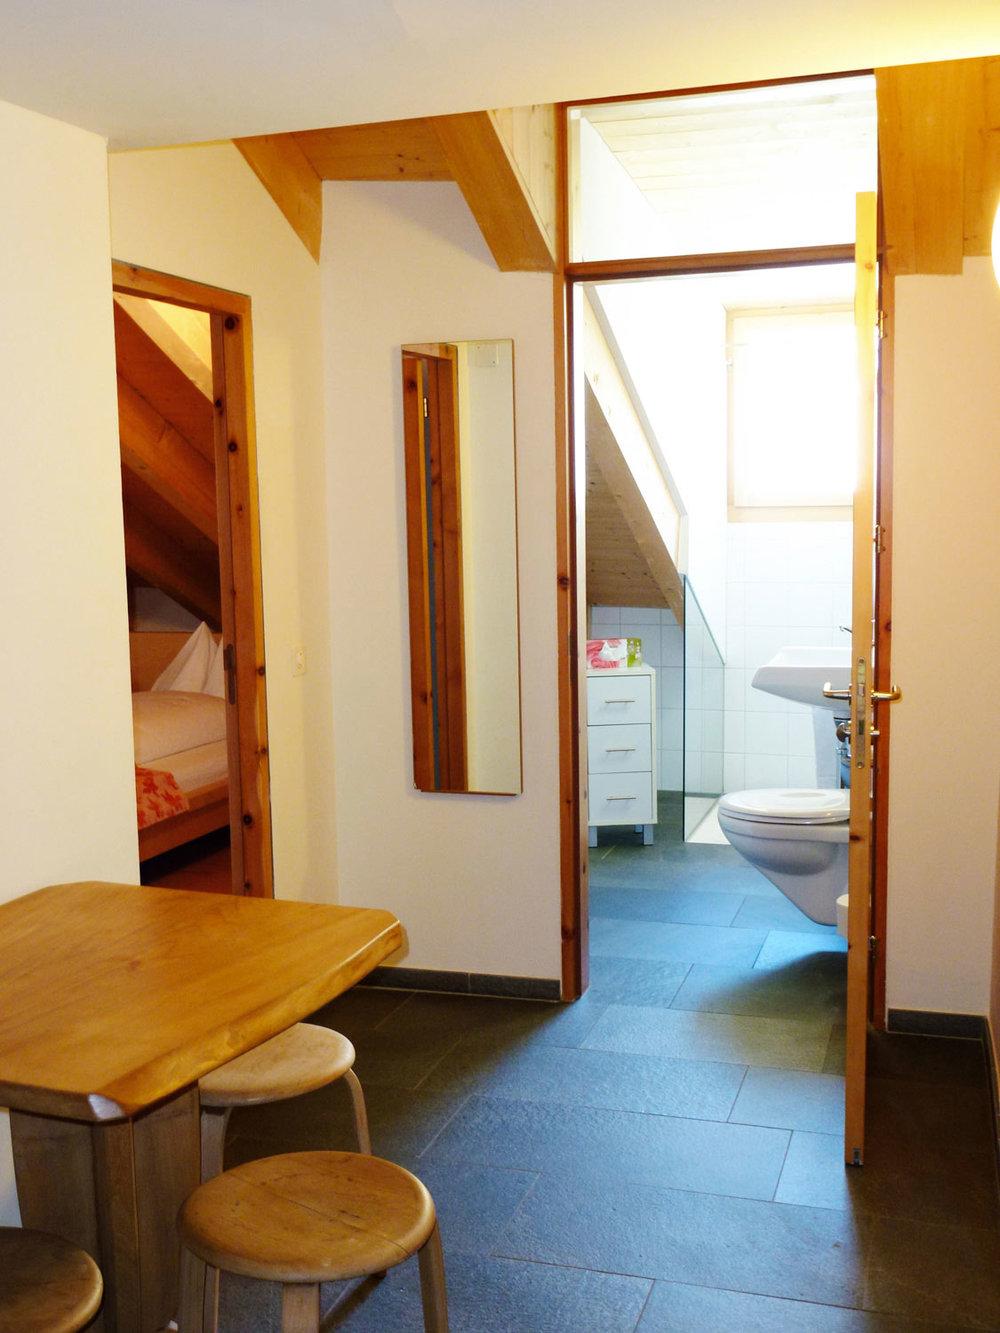 Wohneinheit-4-Personen-Hotel-Plazzo-Mysanus-1.jpg